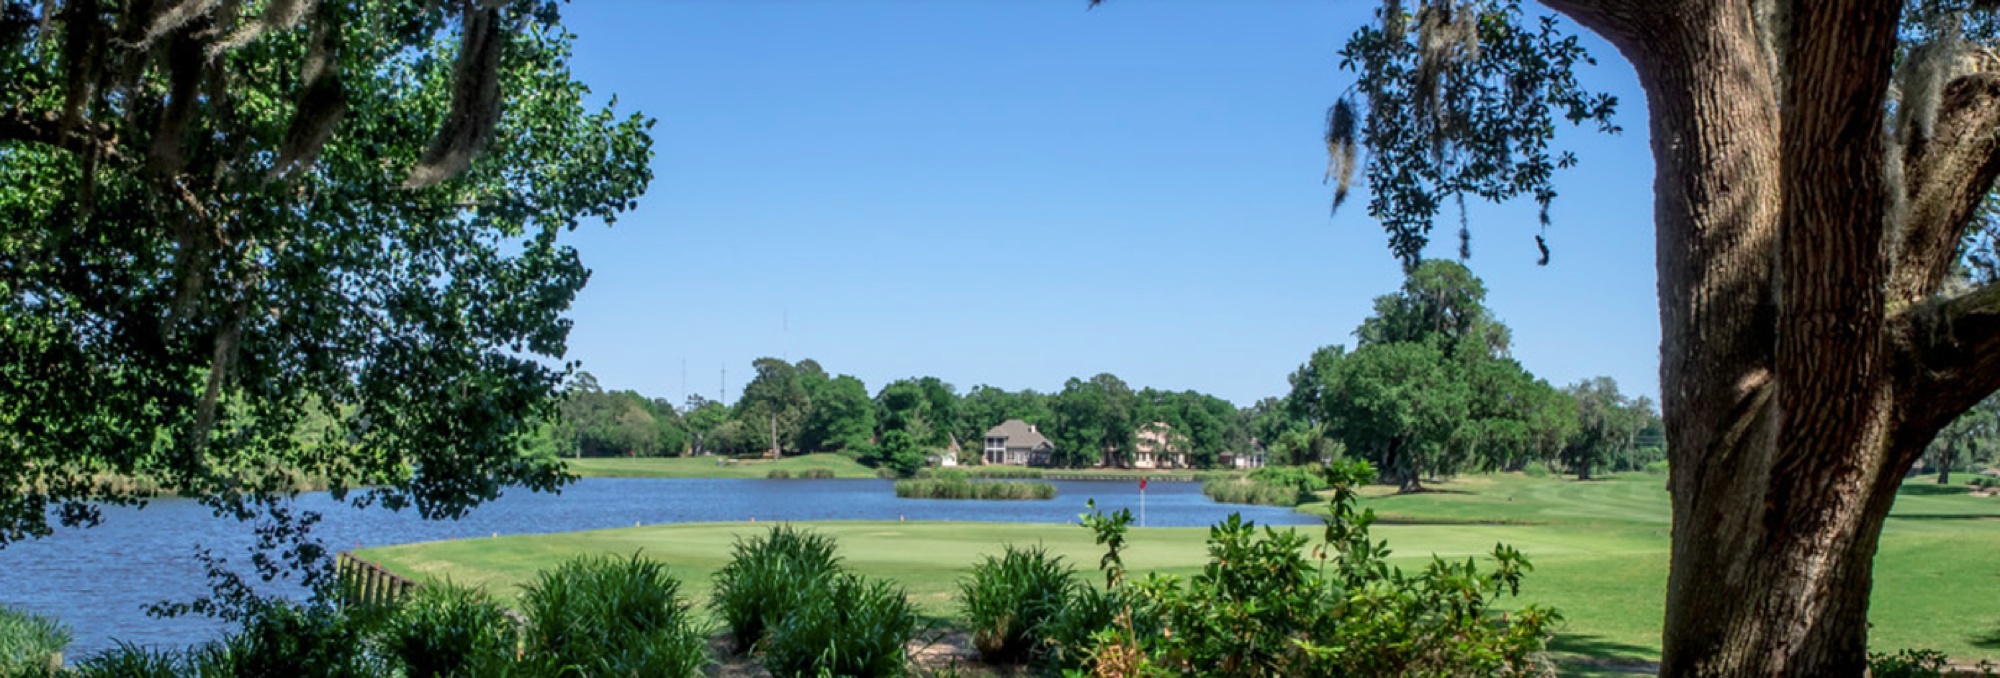 Heritage Golf Myrtle